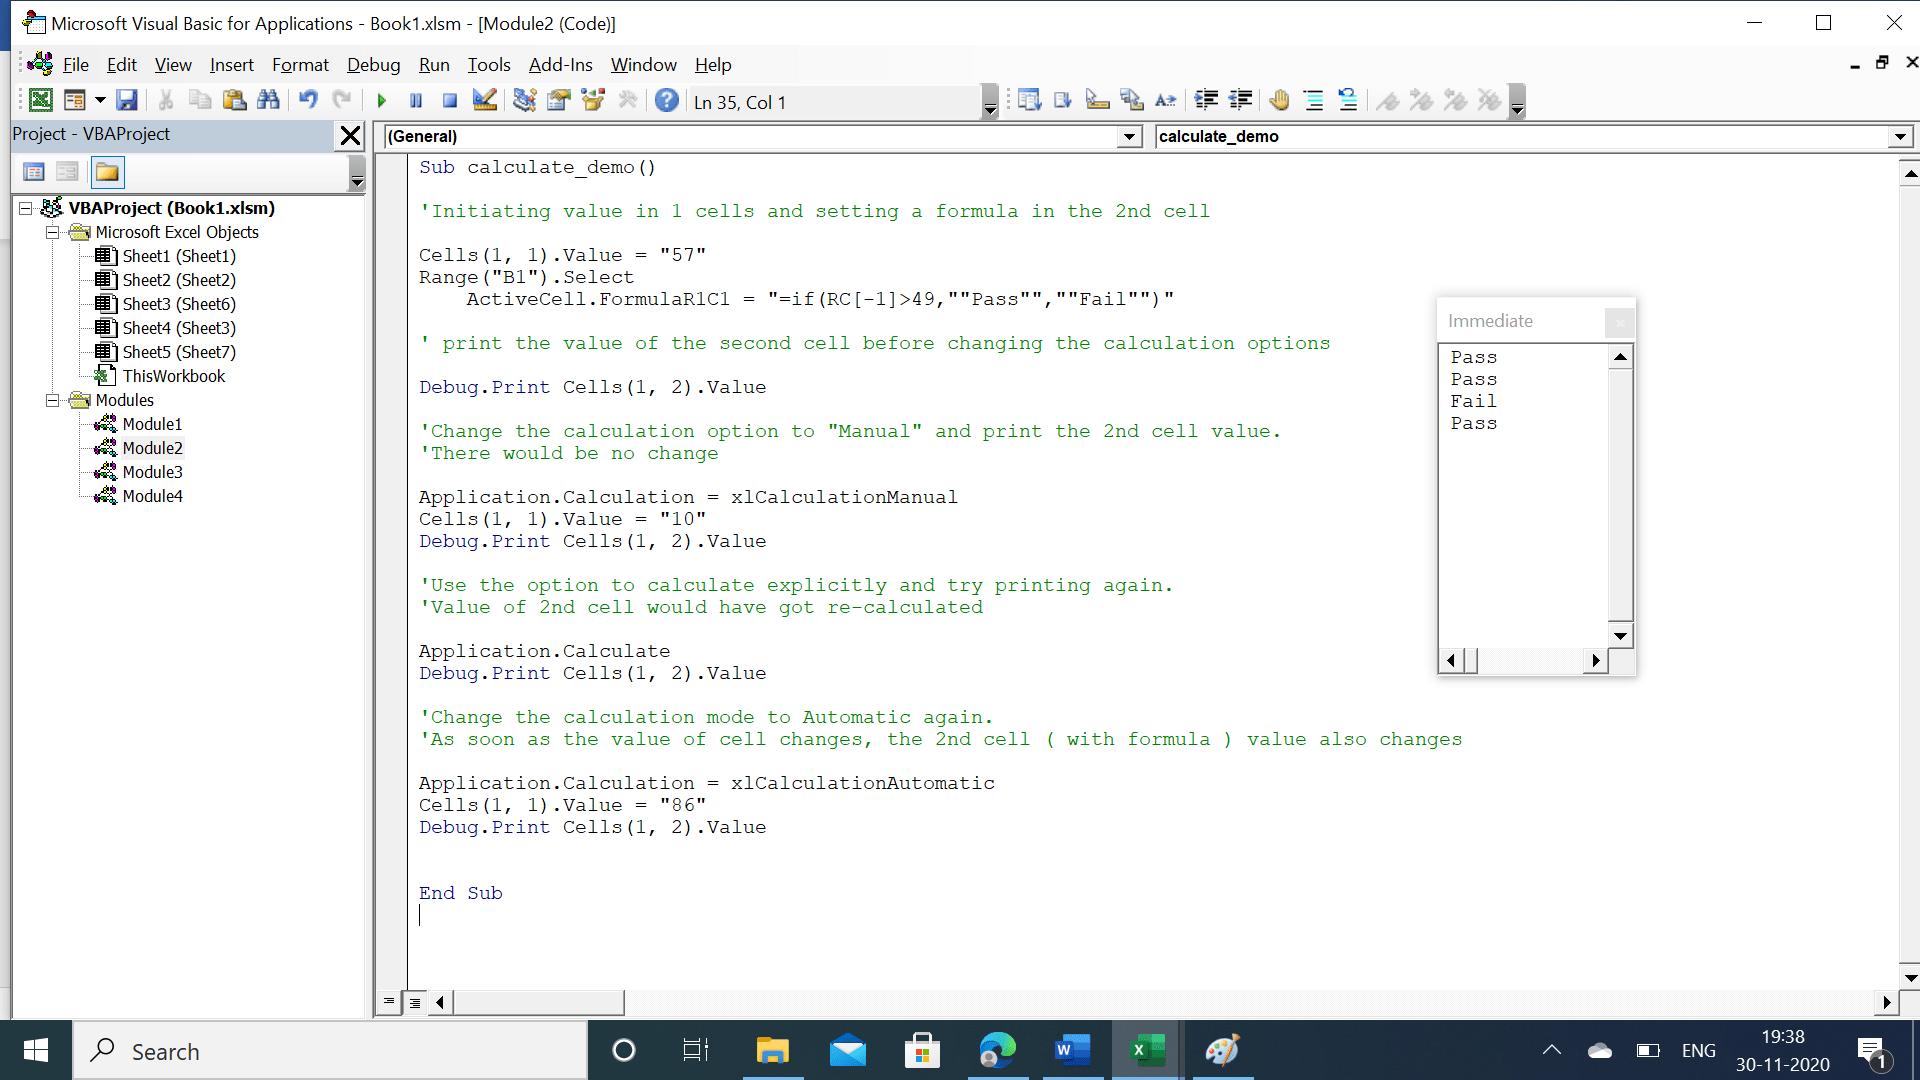 Immediate window showing pass/fail grades